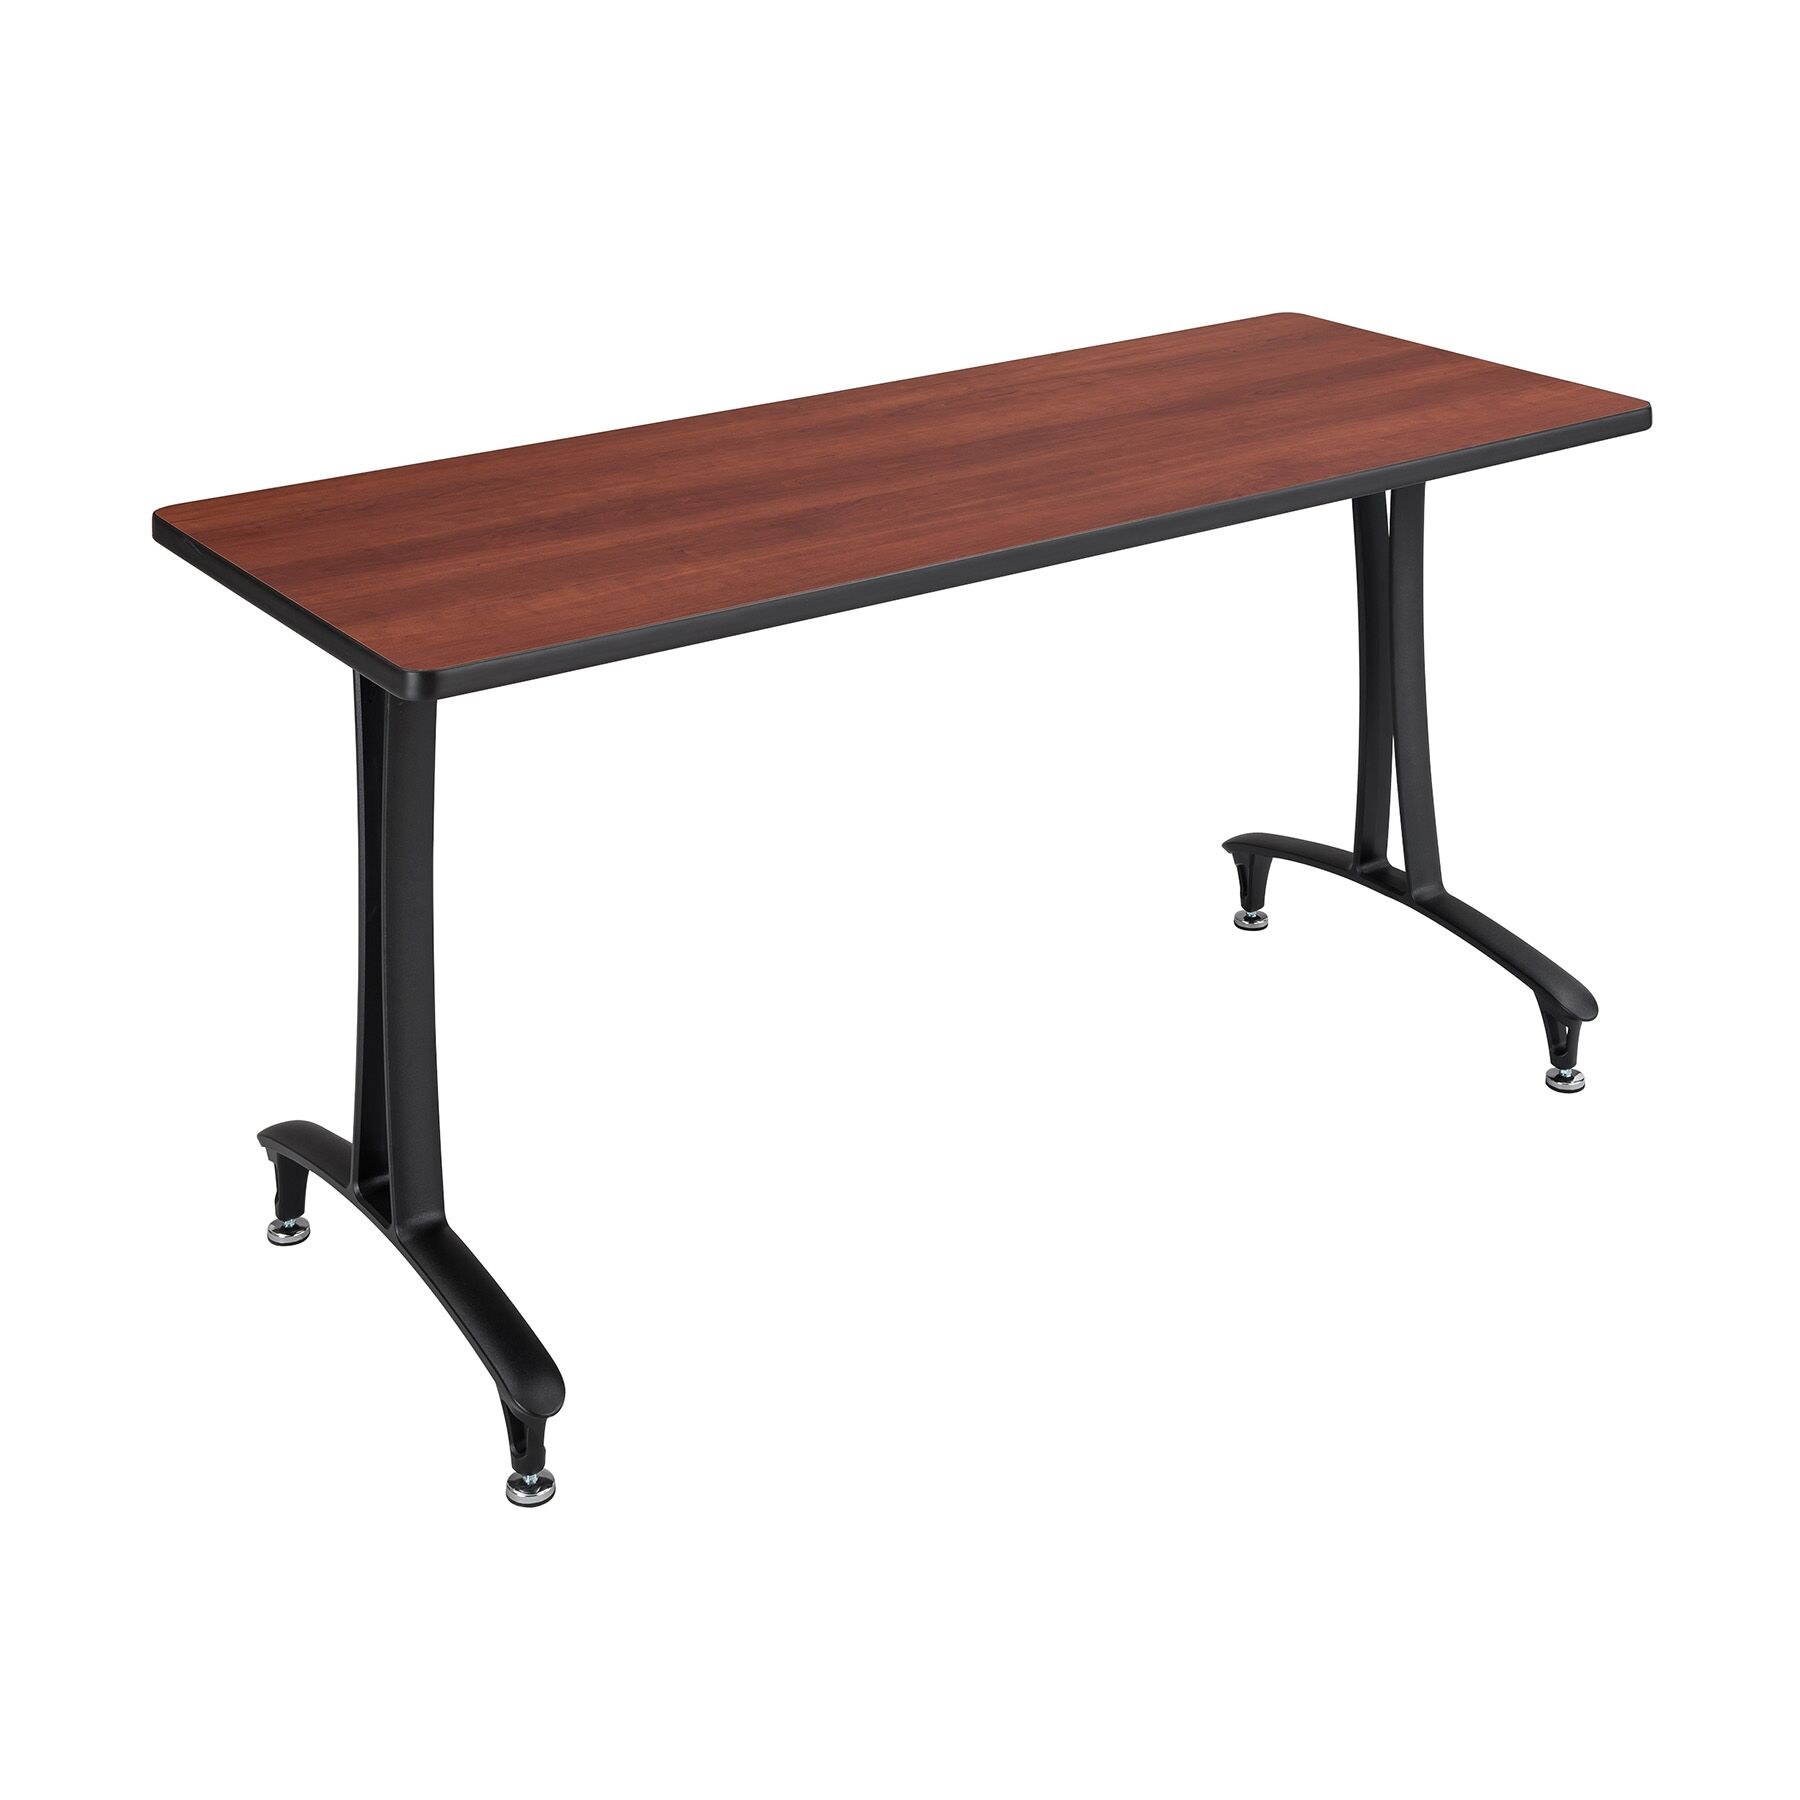 Rumba� Rectangular Conference Table Base Finish: Black, Top Finish: Cherry, Size: 5' L